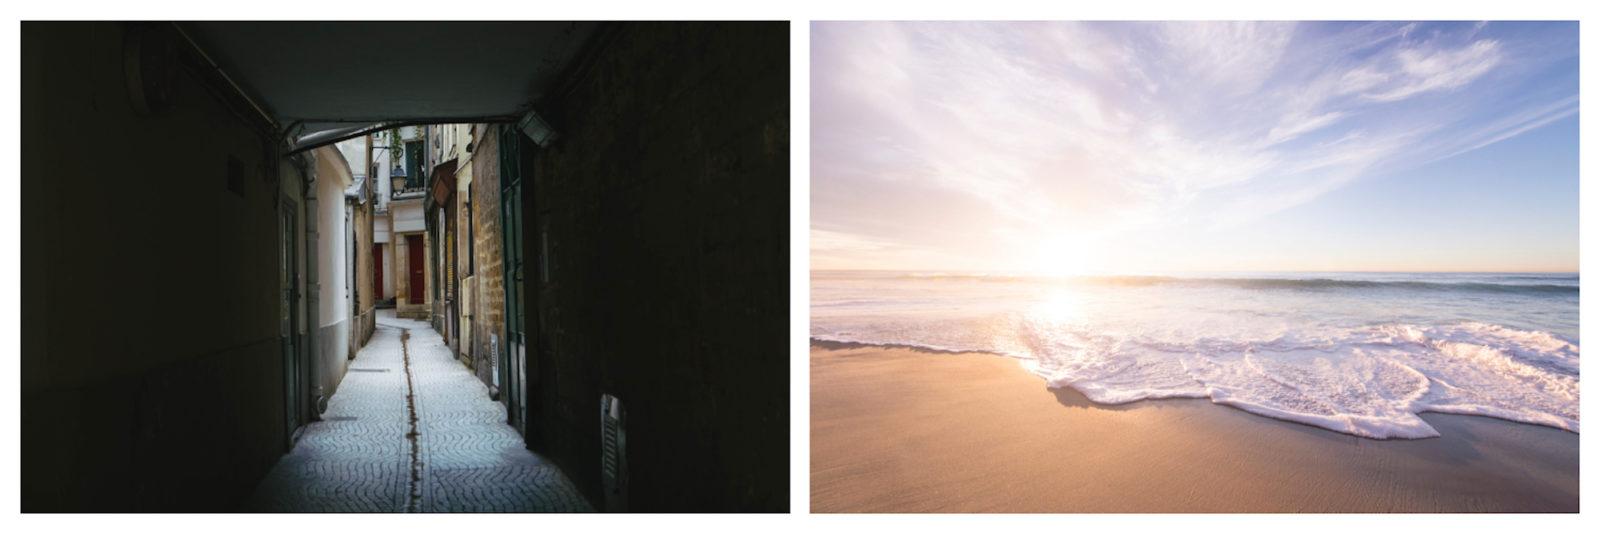 Exploring Paris' narrow winding passageways (left). A dreamy deserted beach and big blue skies at sunrise (right).